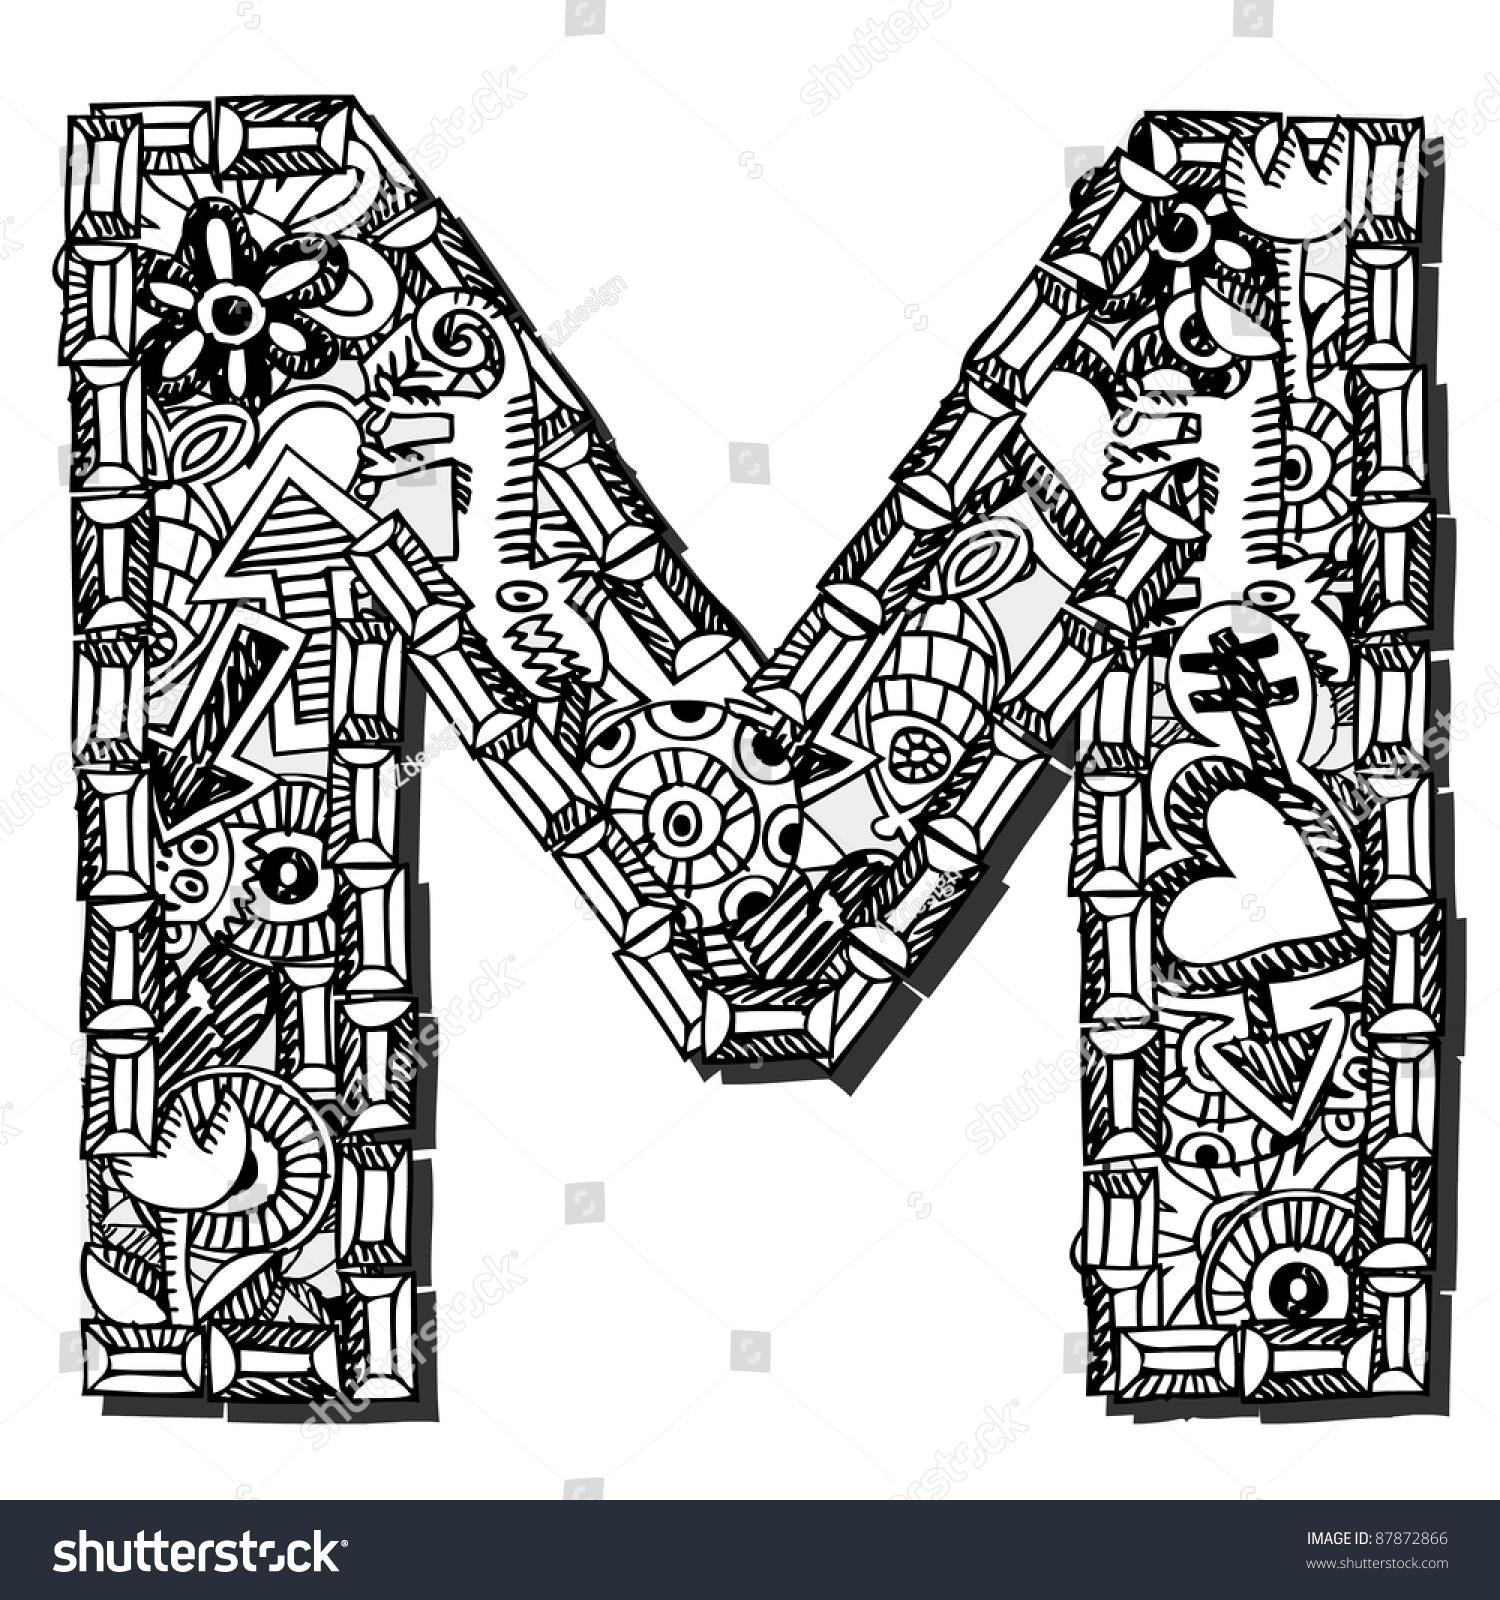 Childlike Doodle Abc Crazy Letter M Stock Illustration